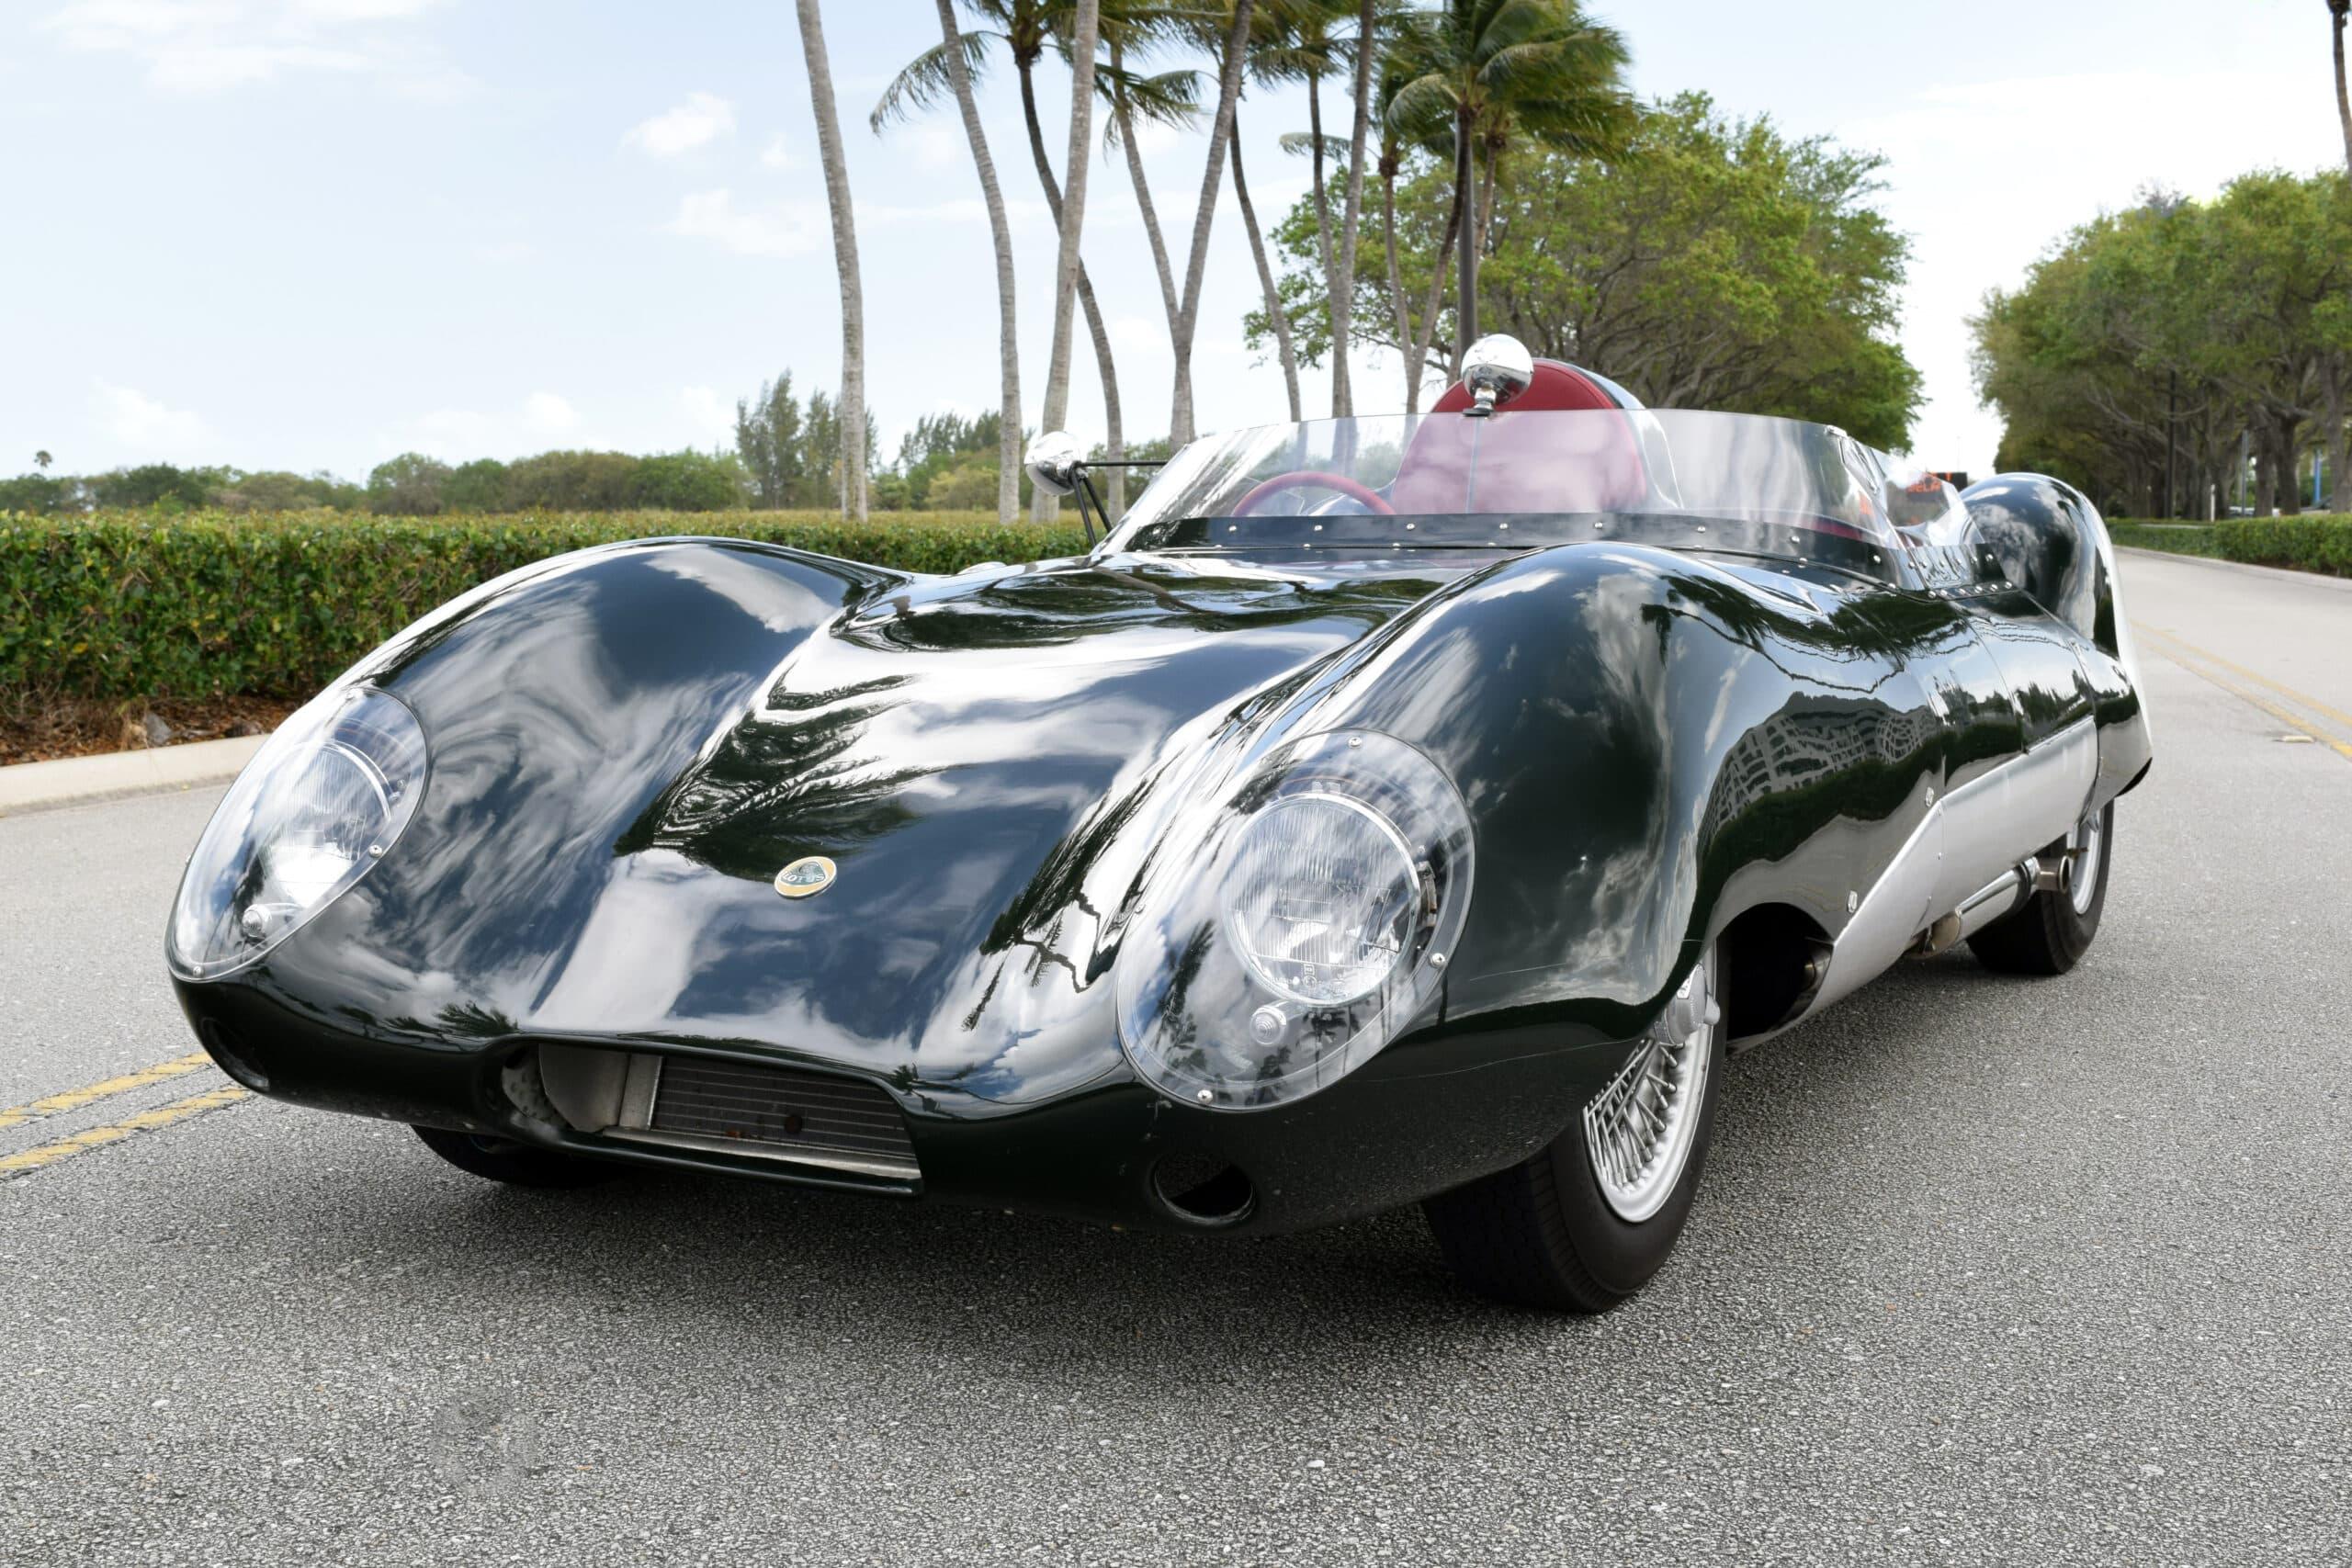 1970 Lotus Eleven Westfield tribute car, BMC 1380cc engine, 130HP, 5-speed, very fast